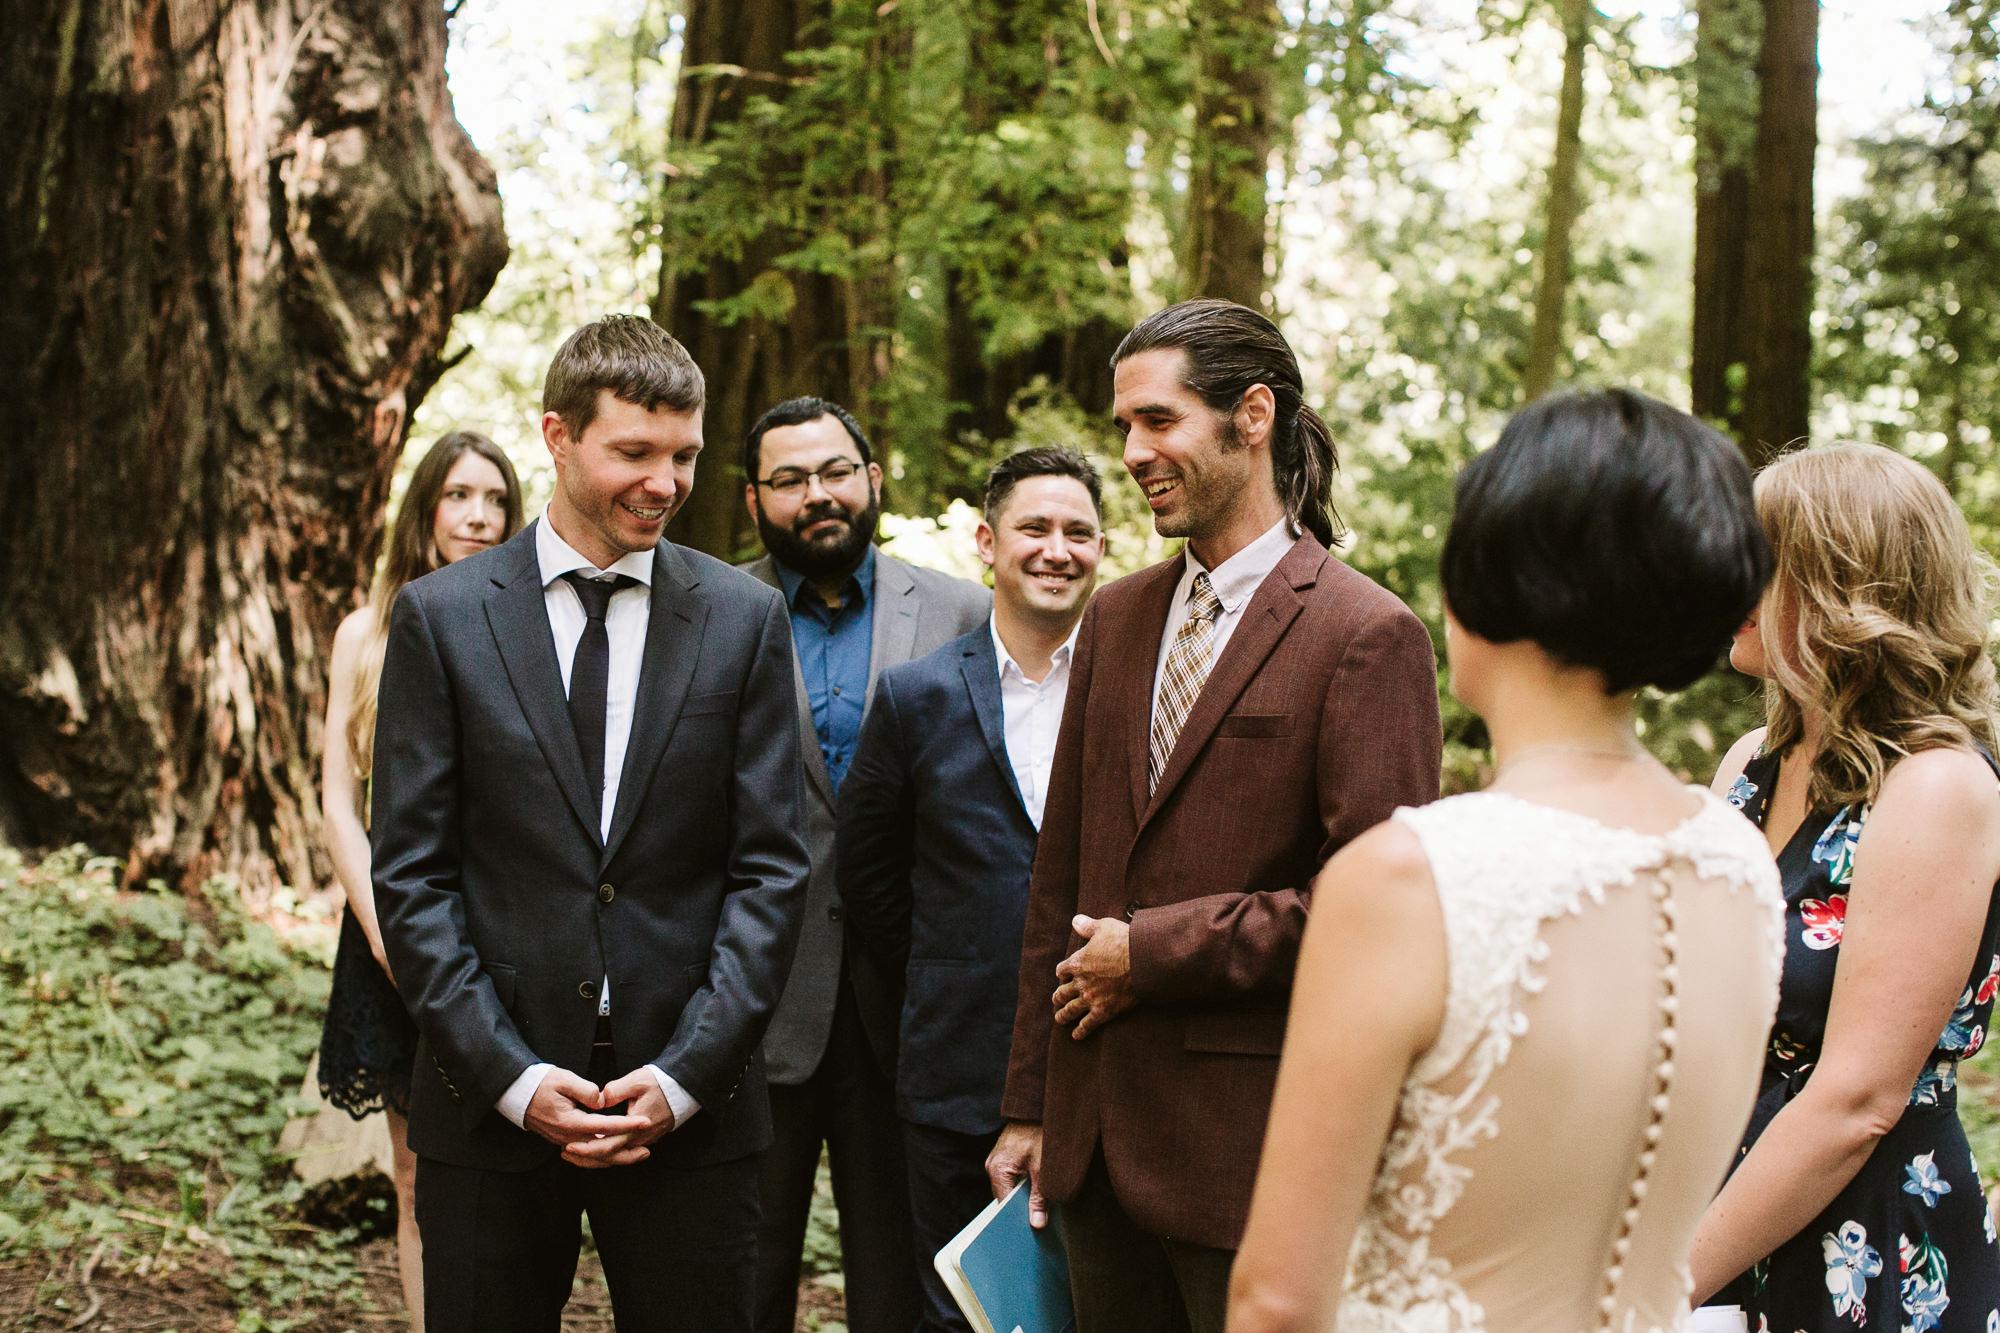 California-wedding-photographer-alfonso-flores-pamplin-groove-195.jpg